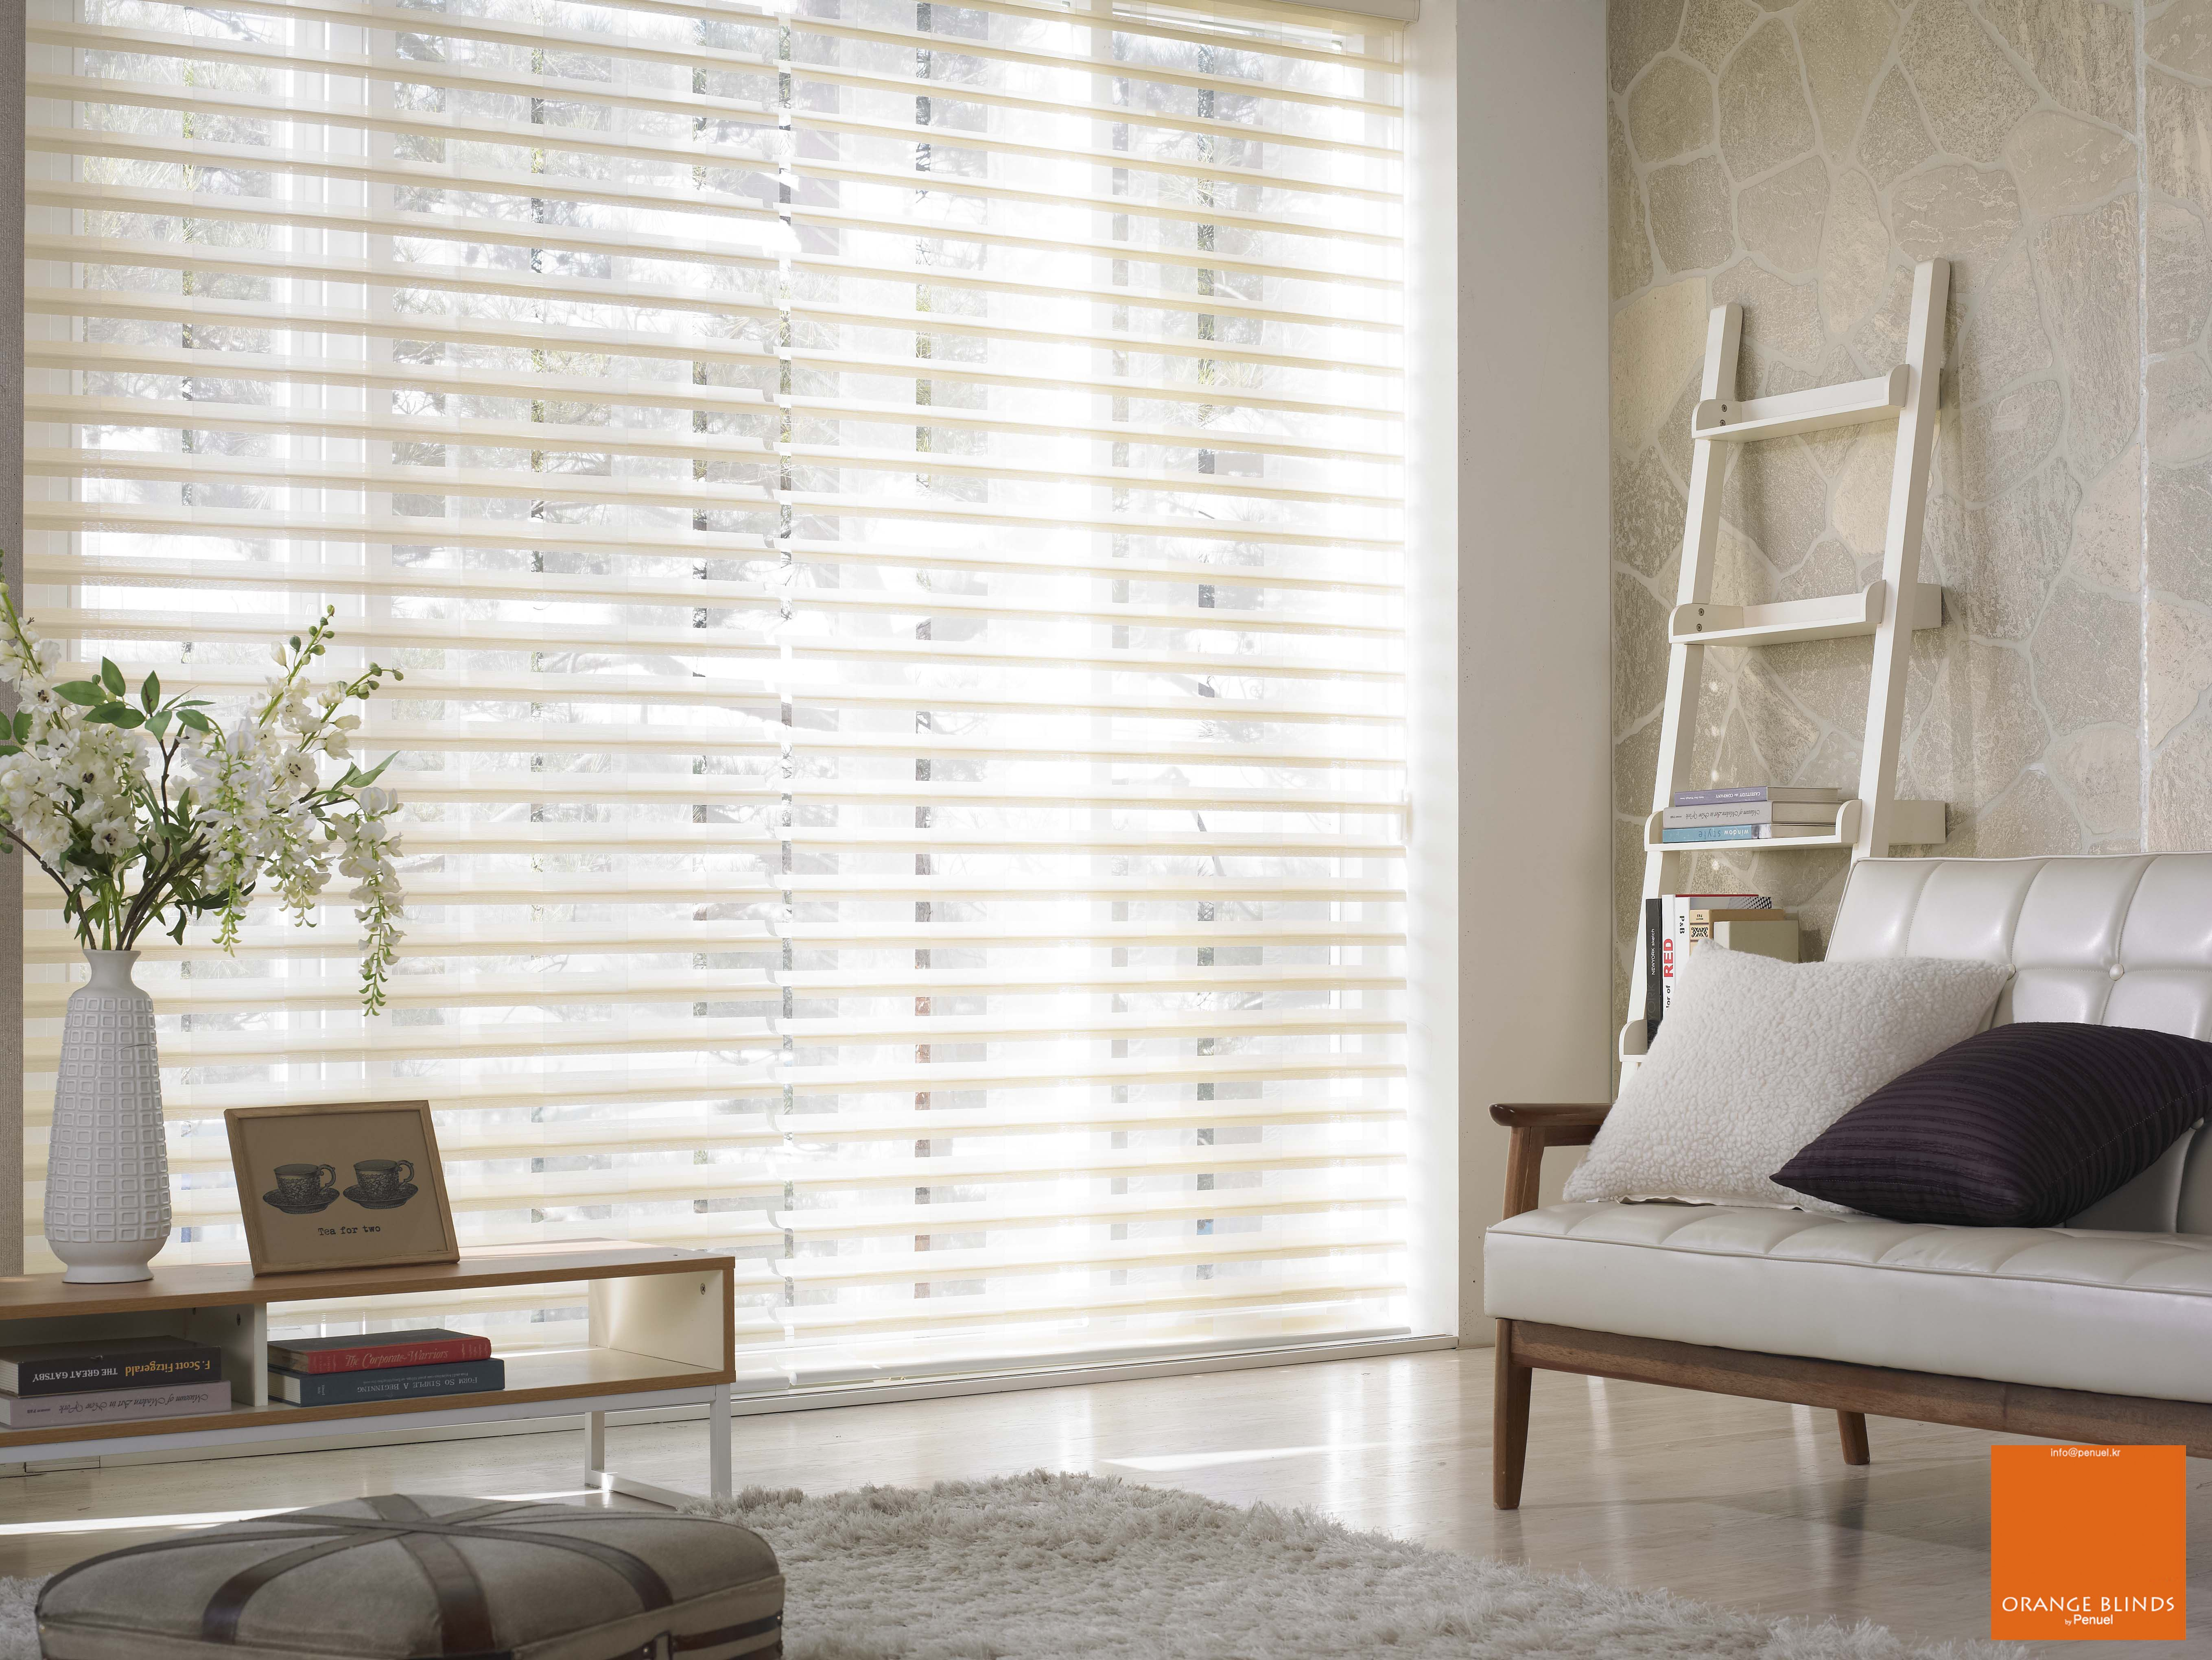 pin blinds on sunroom shades malvarec by la pinterest silhouette shangri persianas